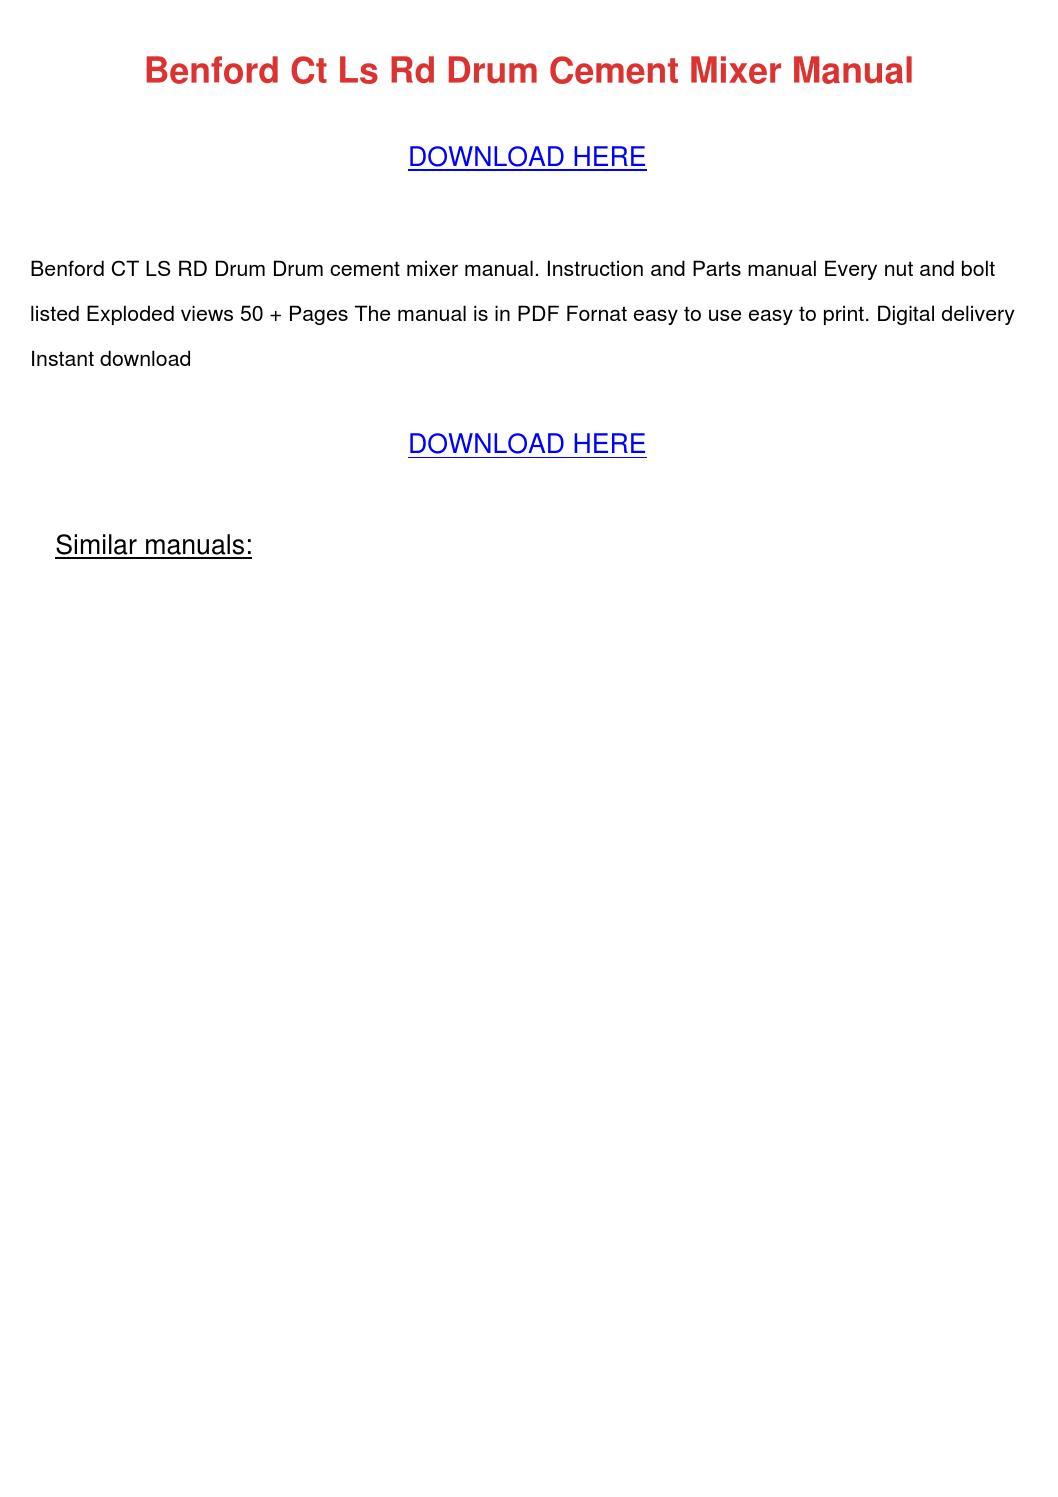 Benford Ct Ls Rd Drum Cement Mixer Manual by JosefinaHogan - issuu